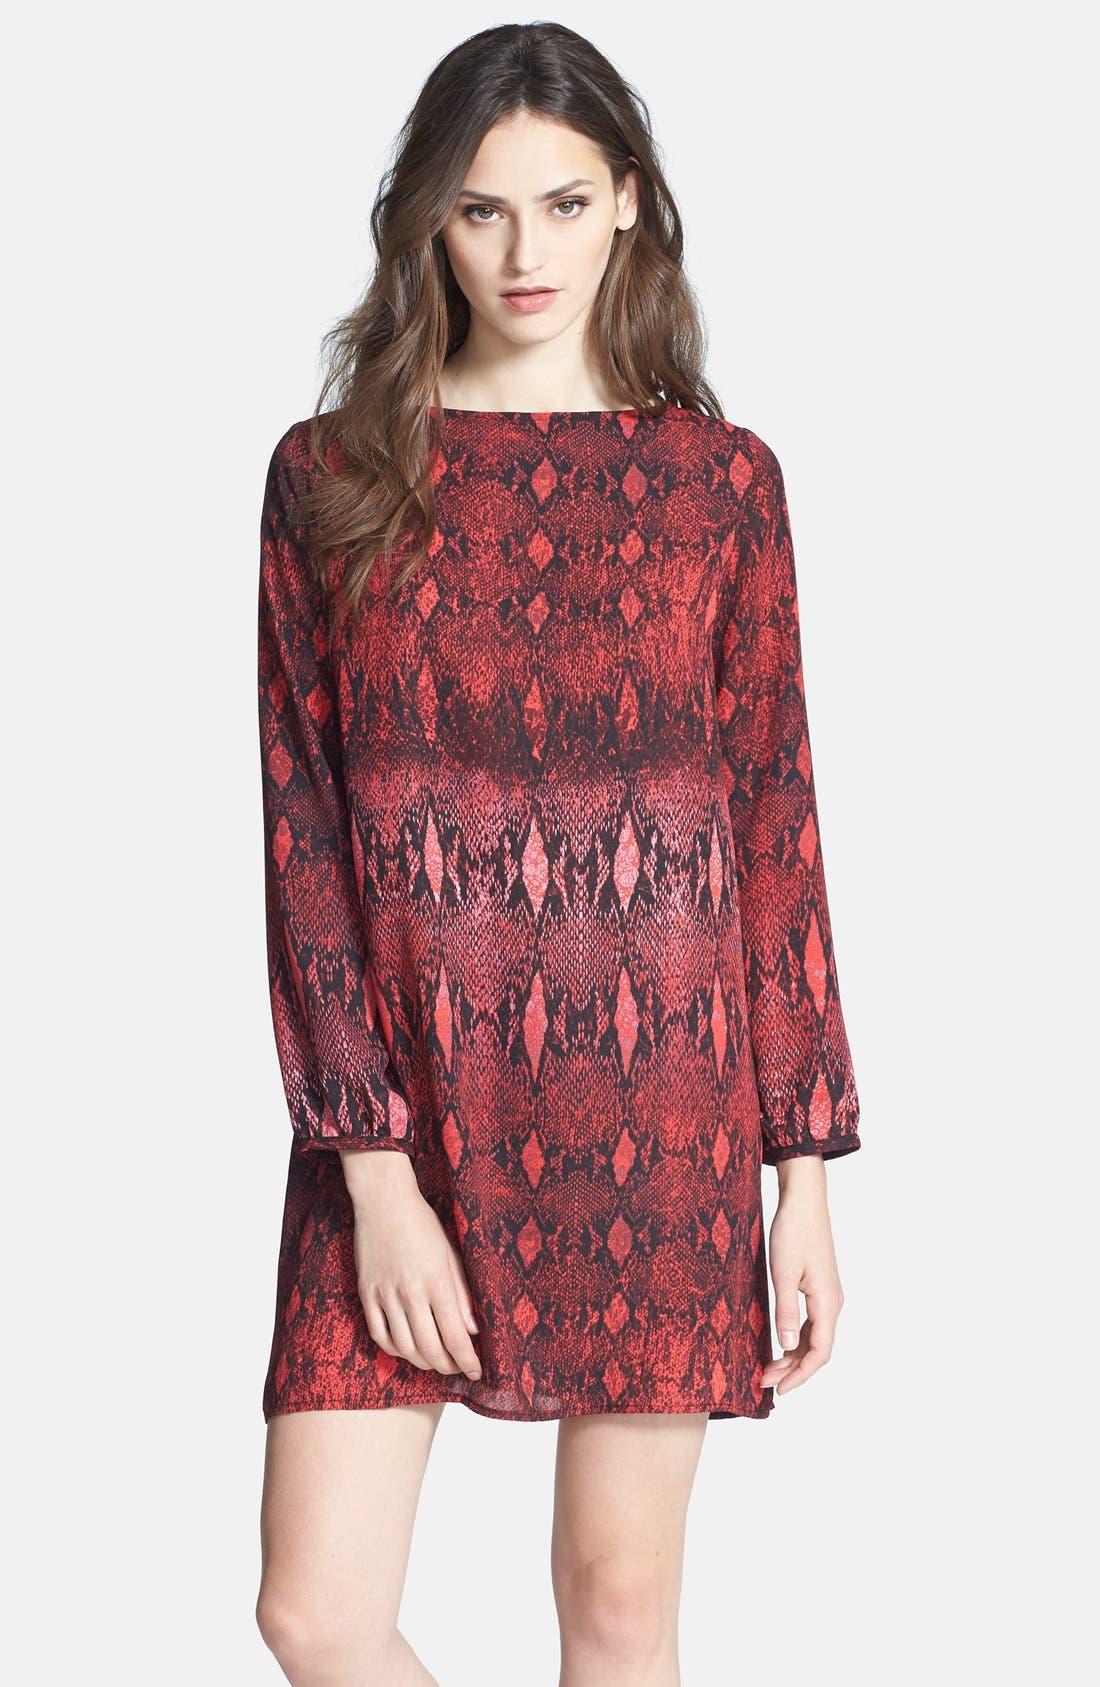 BB DAKOTA 'Vasha' Snakeskin Print Shift Dress, Main, color, 600